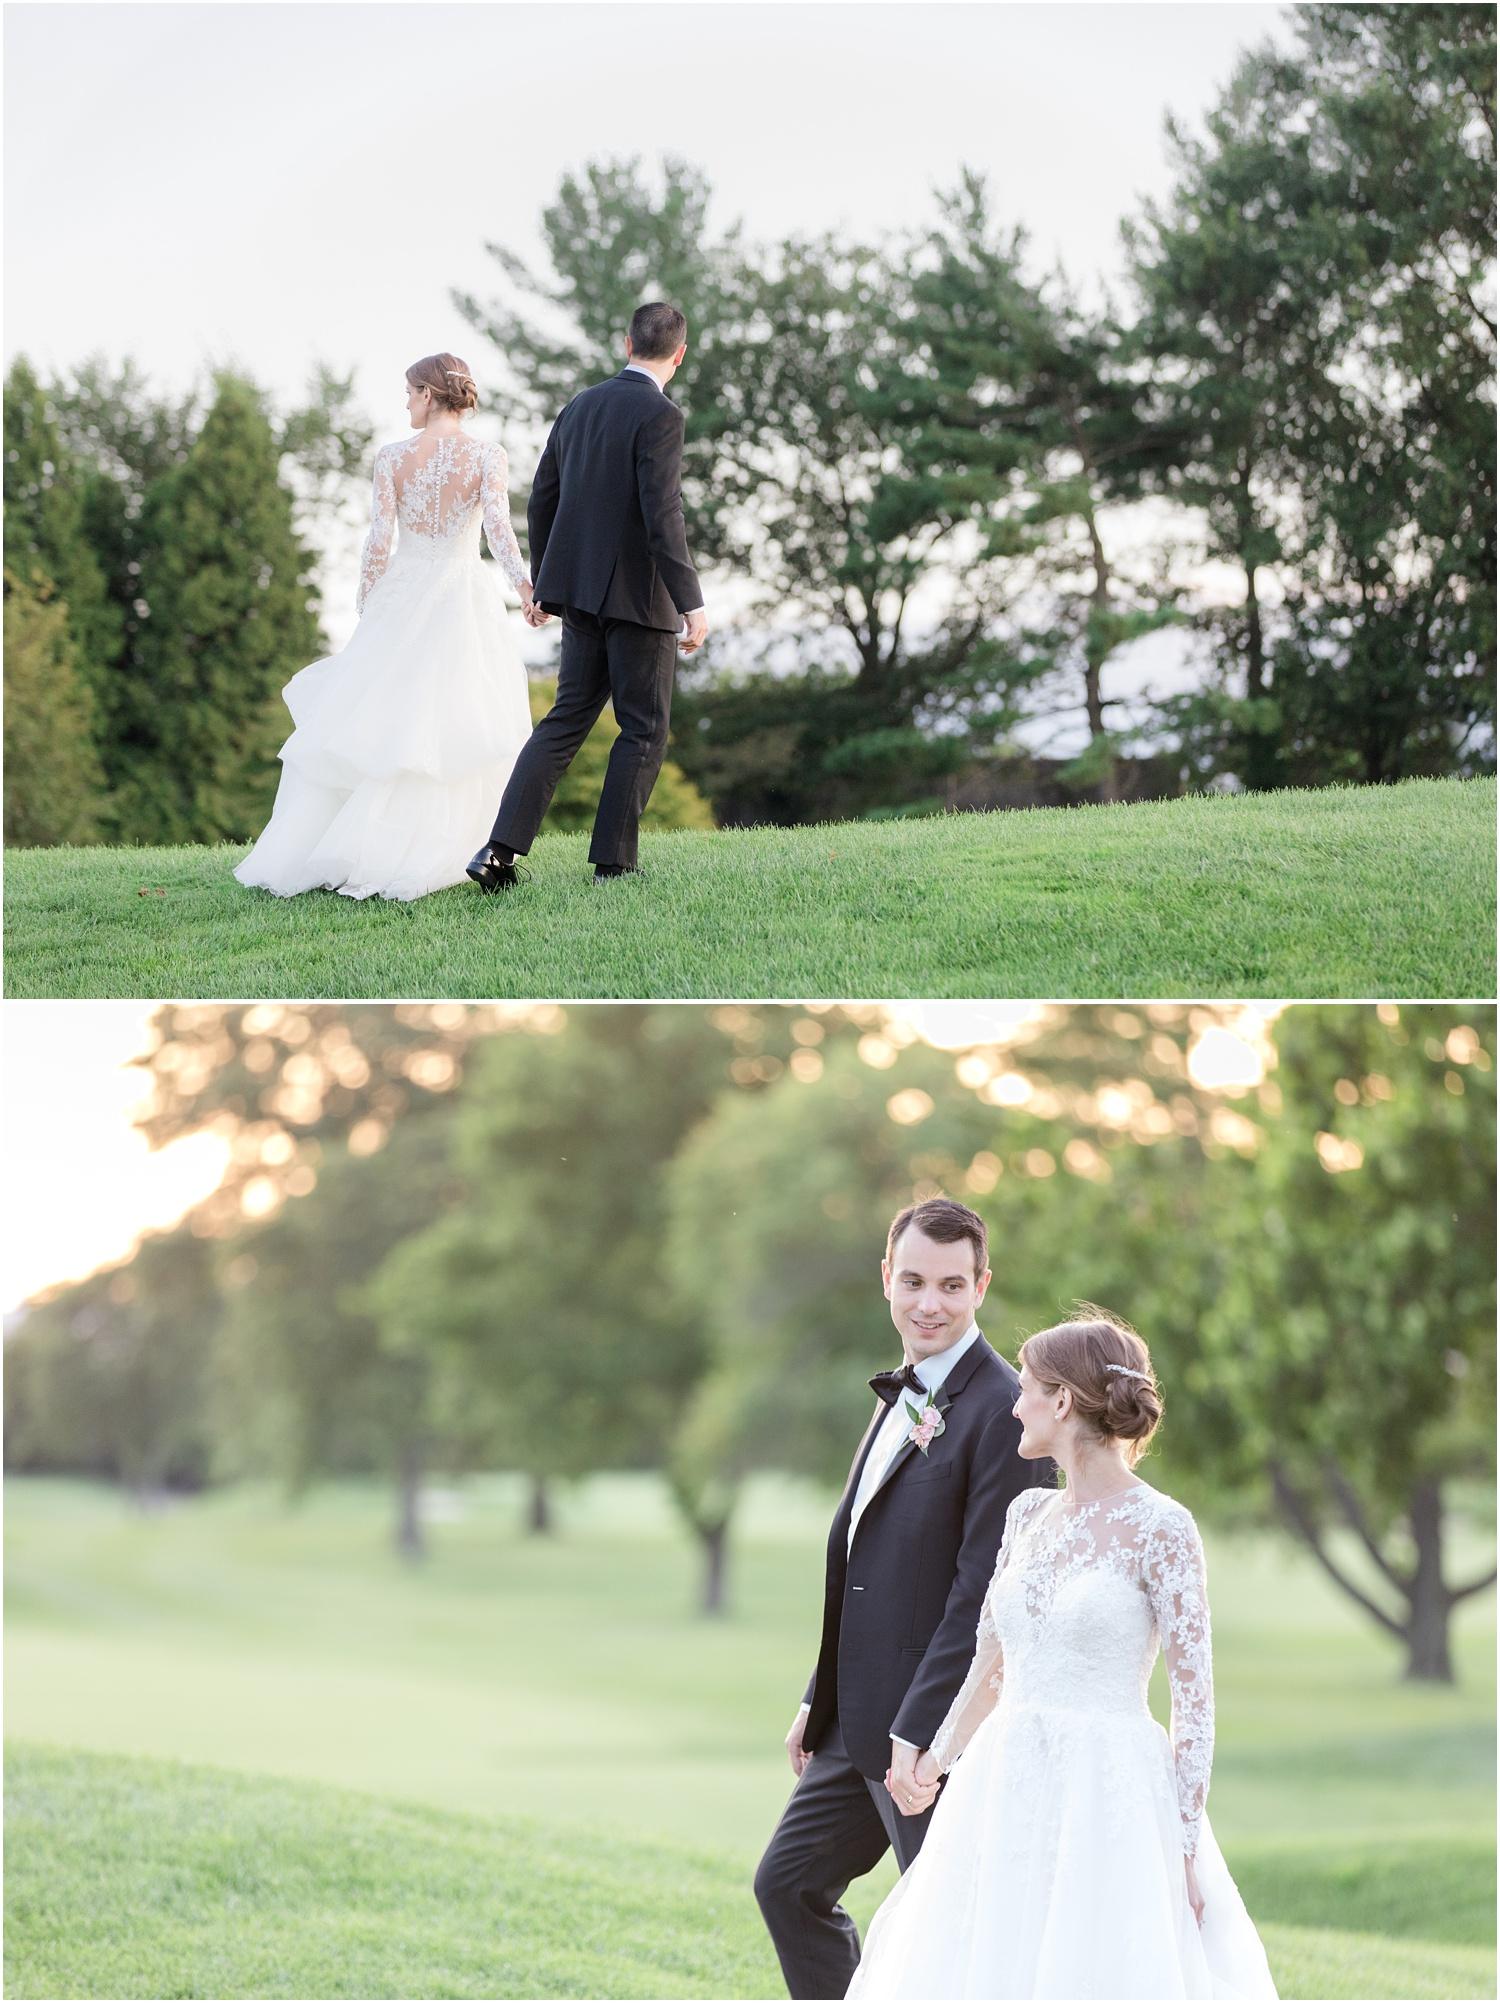 Sunset wedding photos at north nj golf club